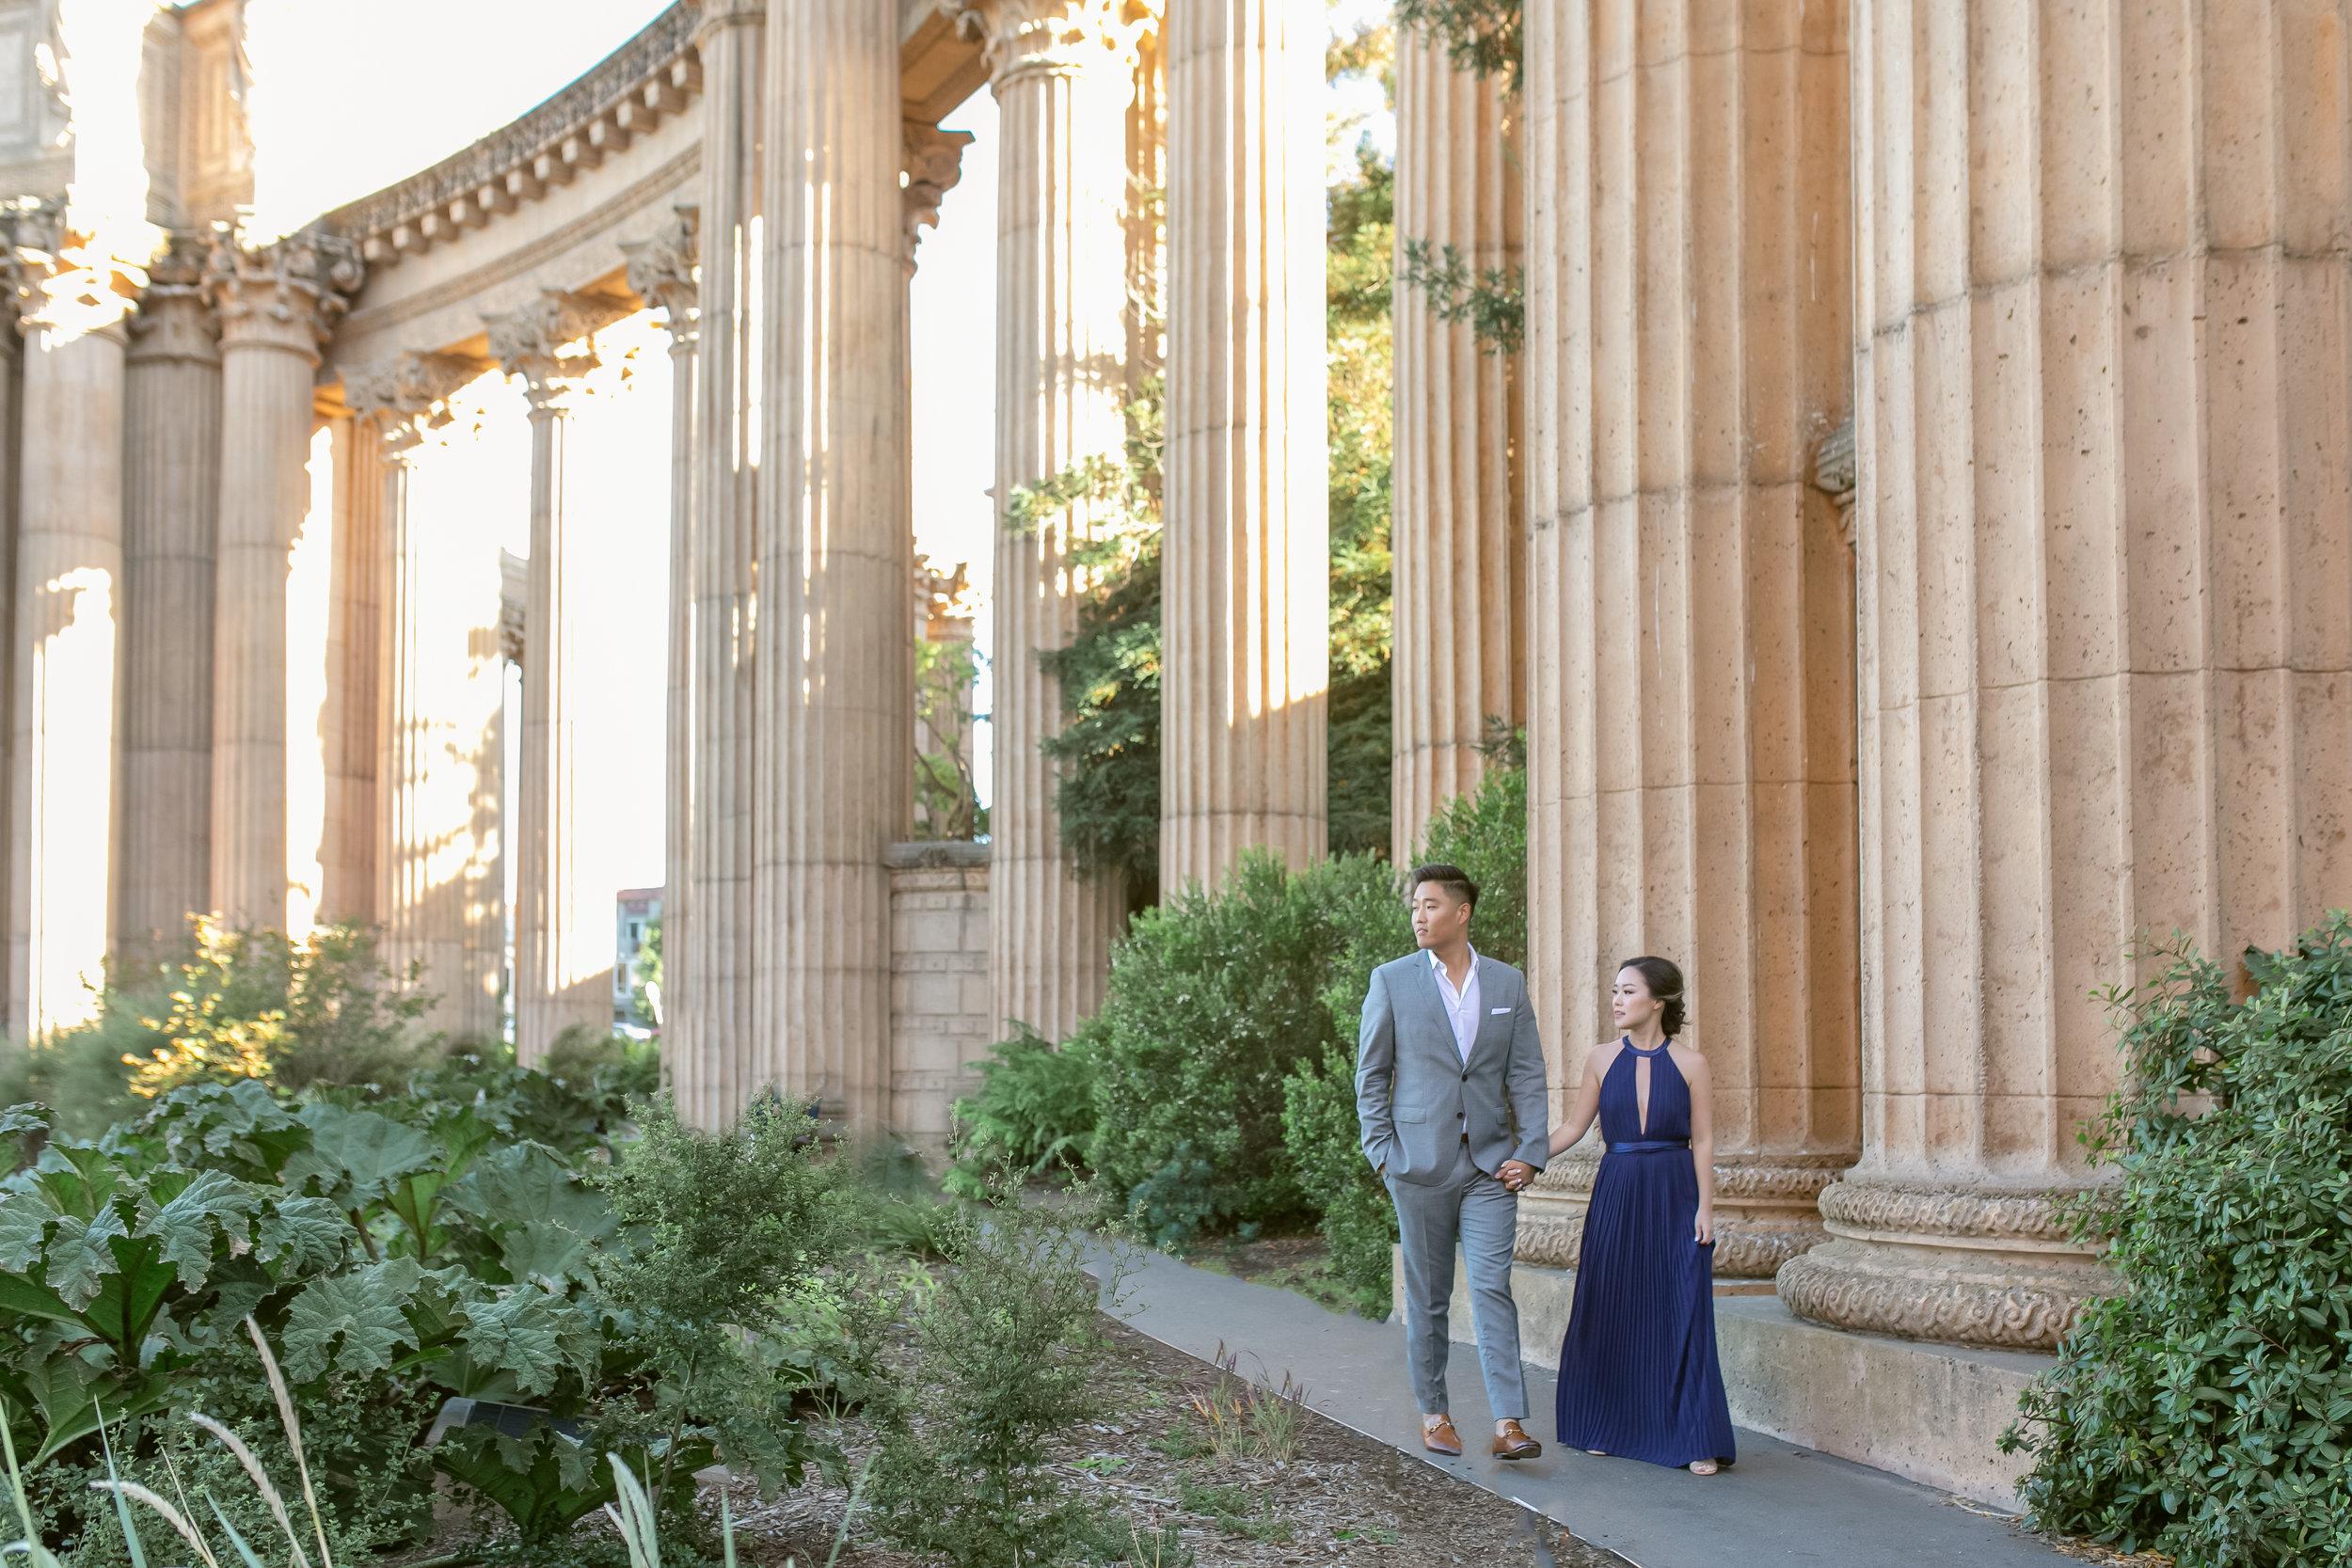 San Francisco Engagement Session 舊金山美式婚紗 - Michelle Chang Photography